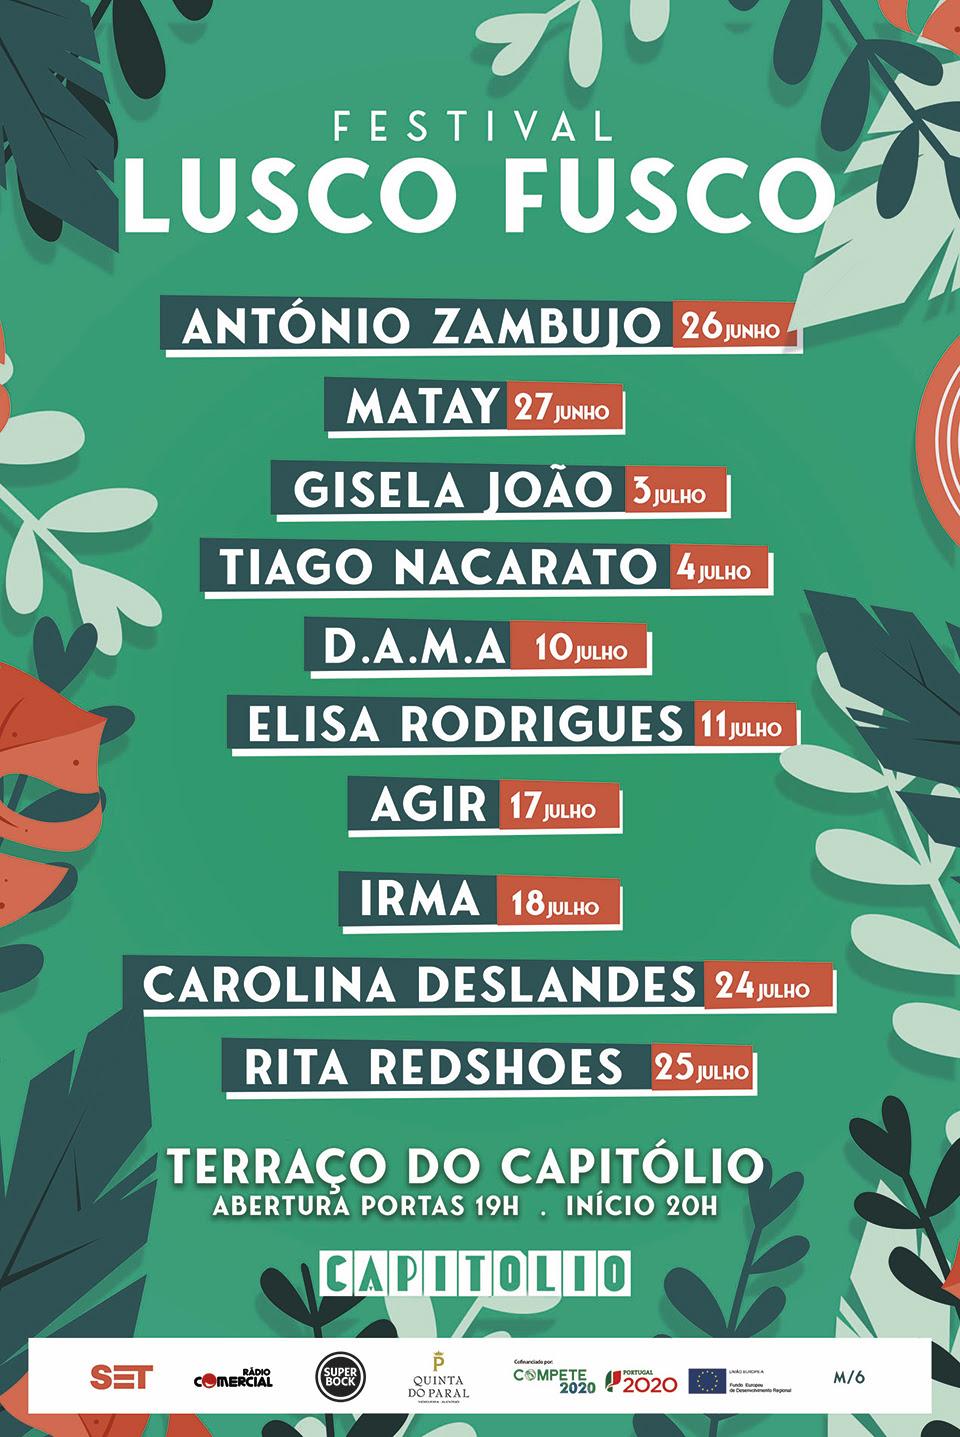 Festival Lusco Fusco - Terraço do Capitólio